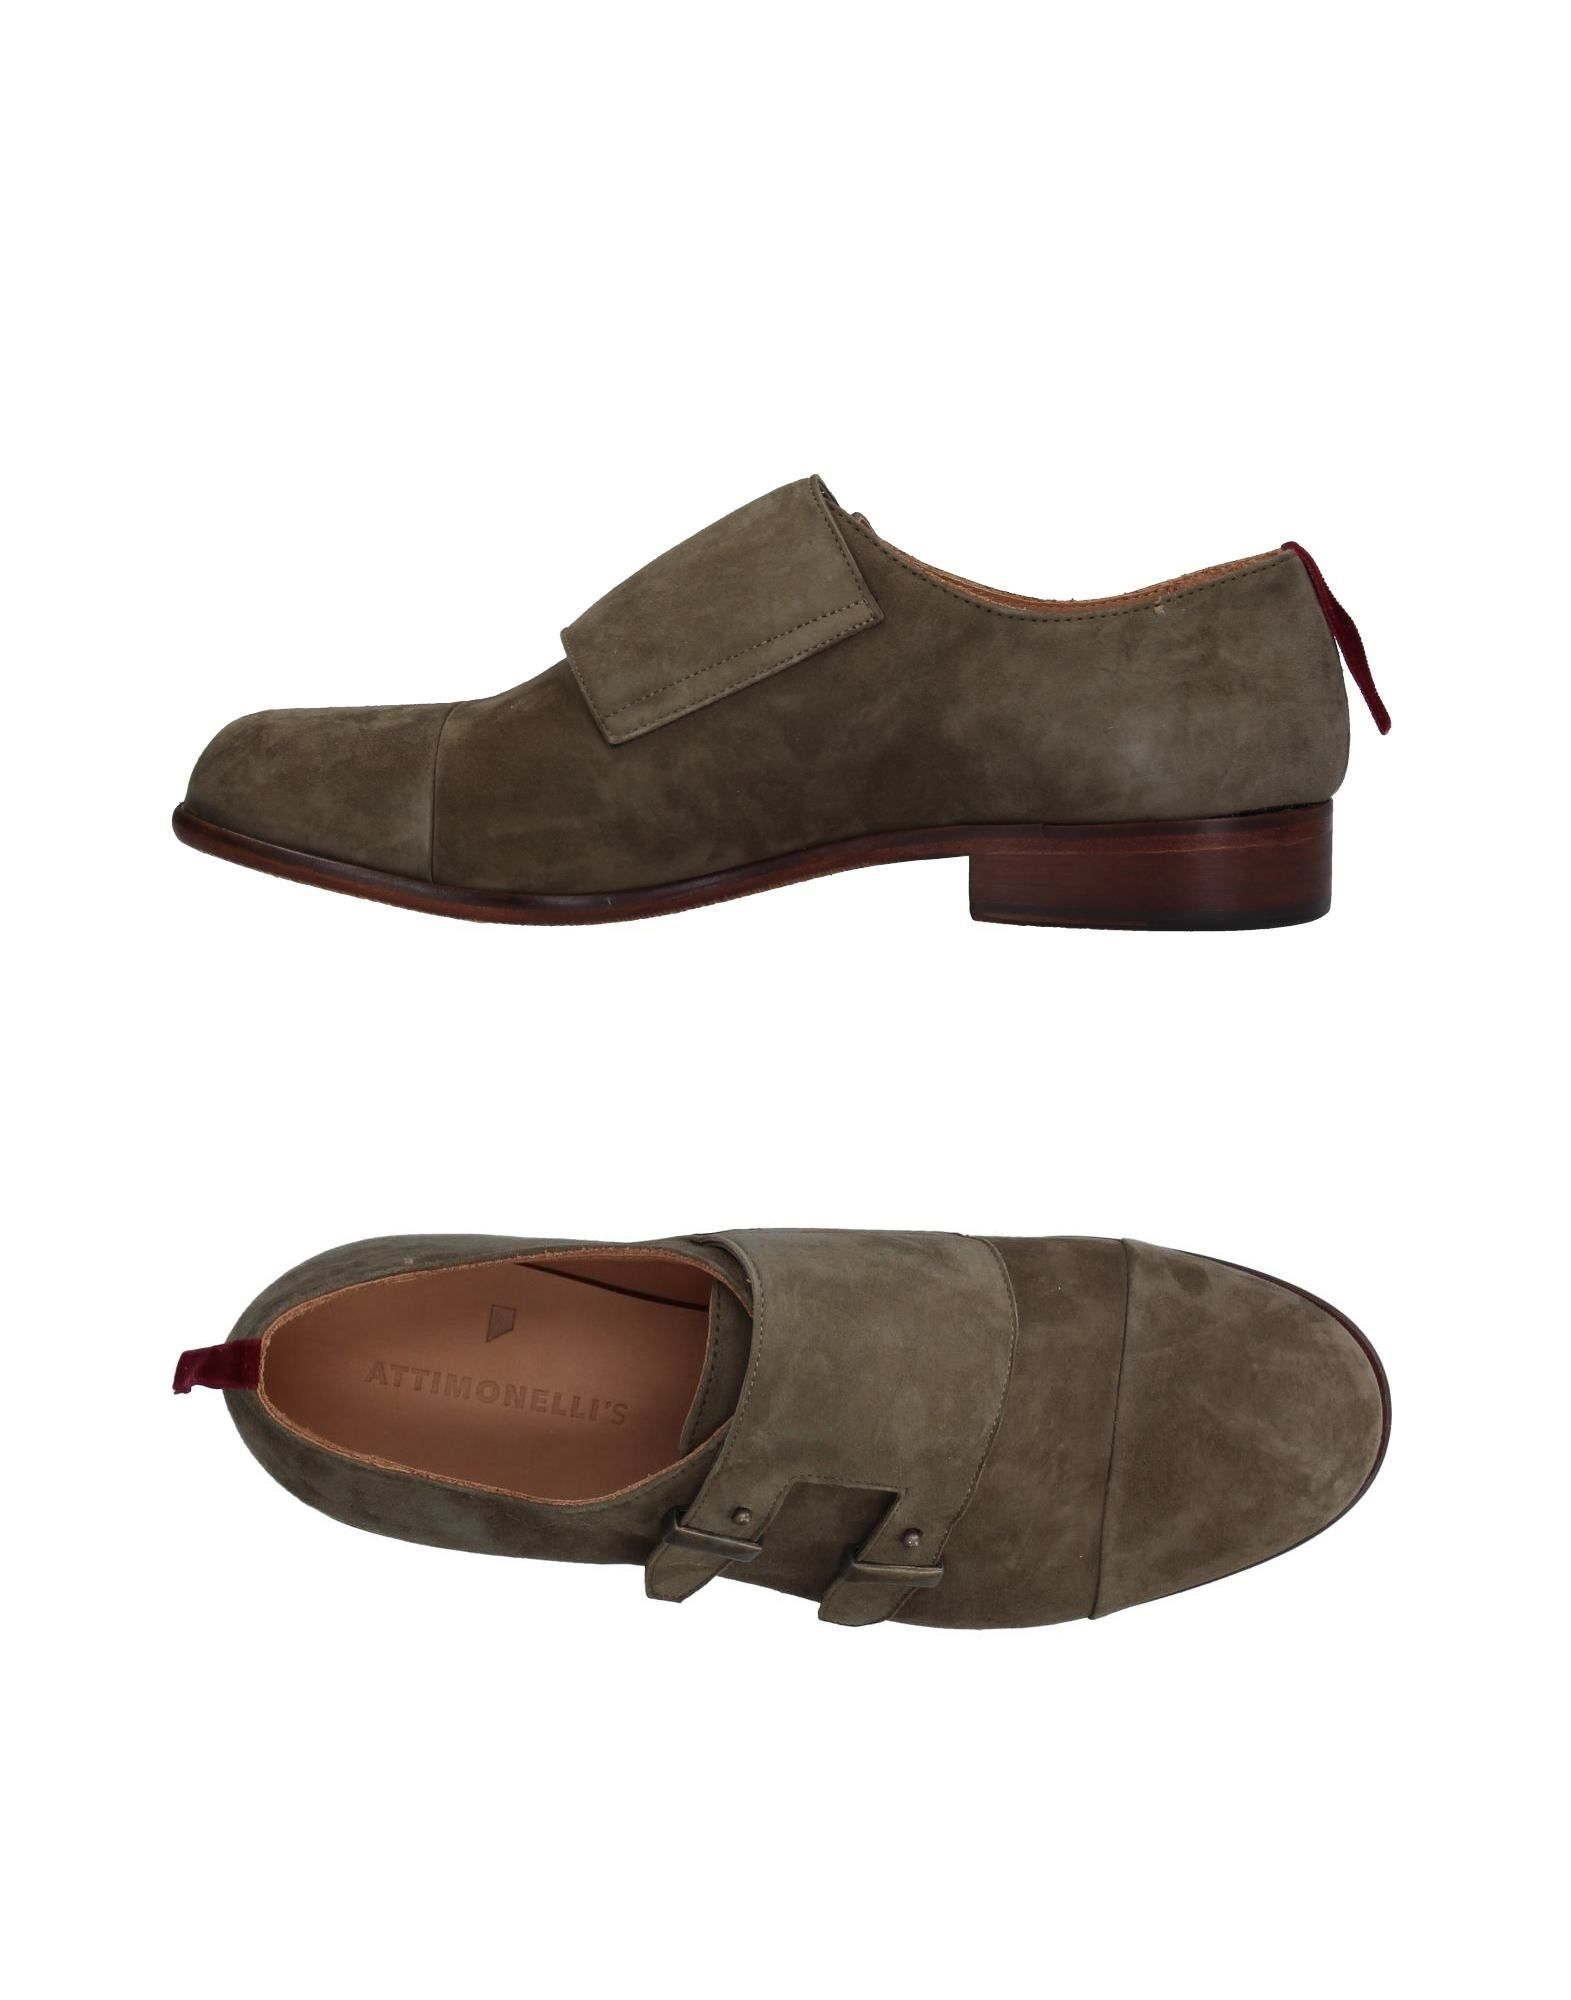 Rabatt echte Schuhe Attimonelli's Mokassins Herren 11332467QV  11332467QV Herren bae9f2